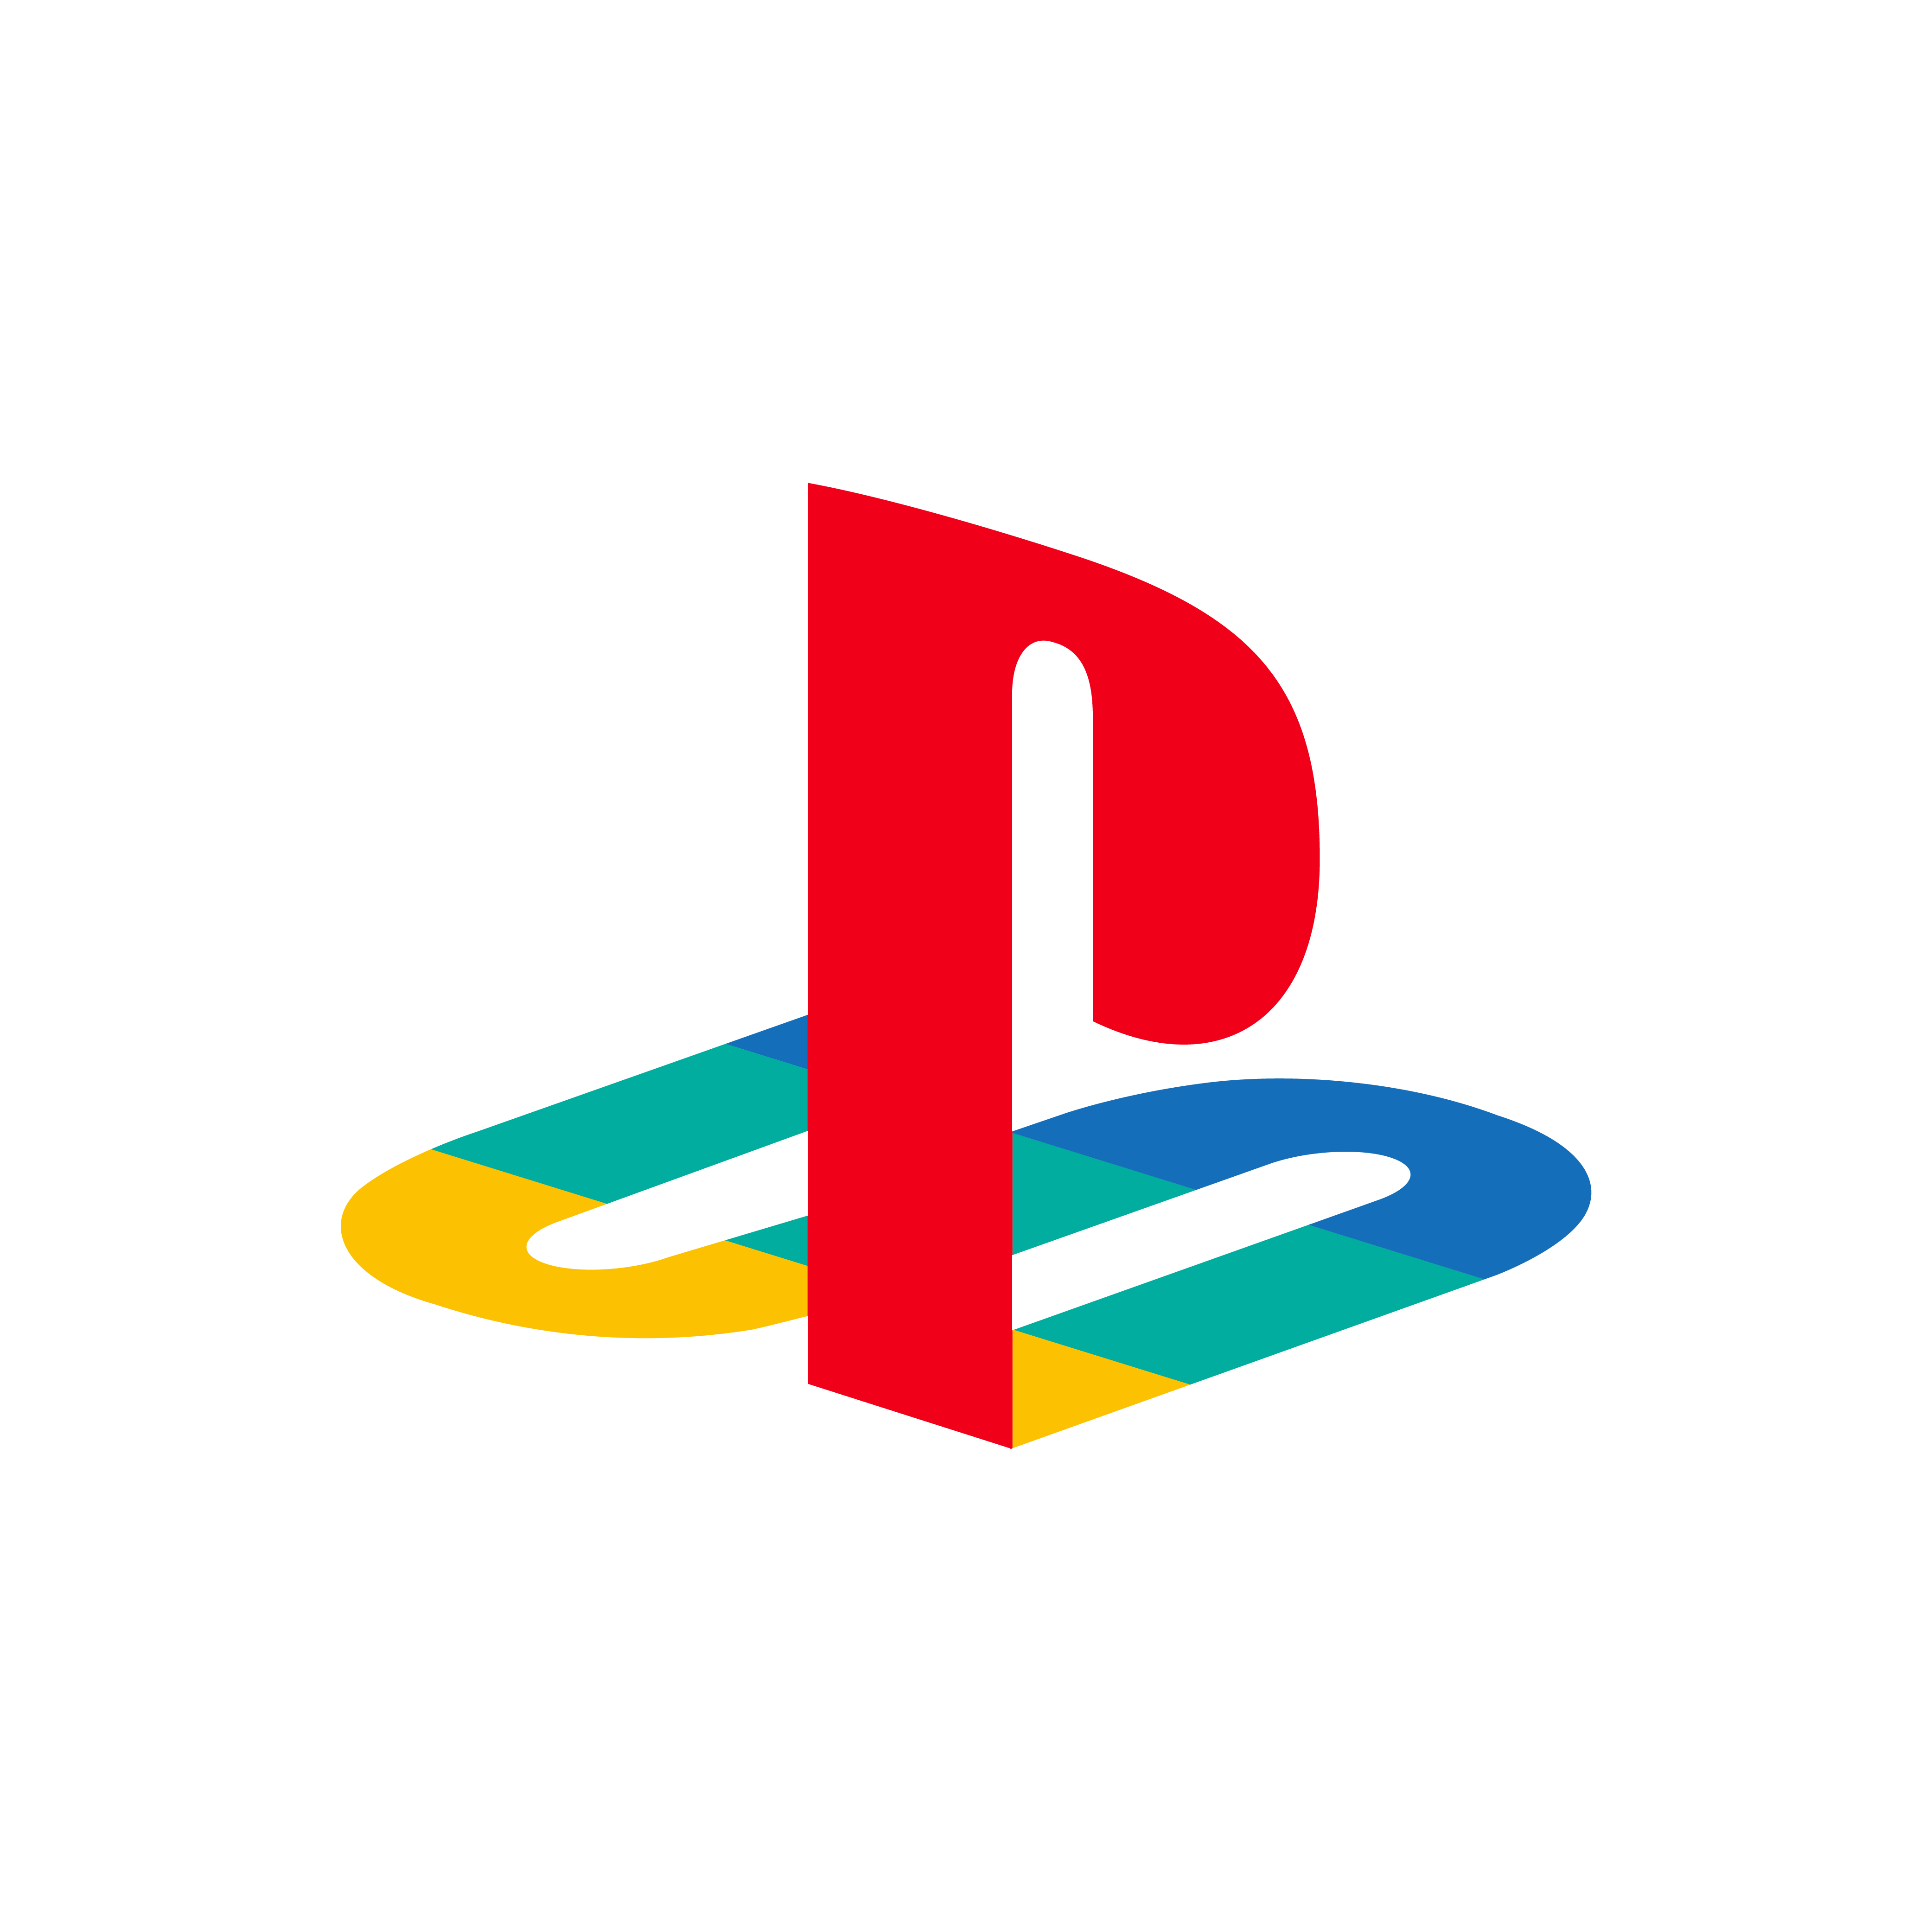 PlayStation Colour